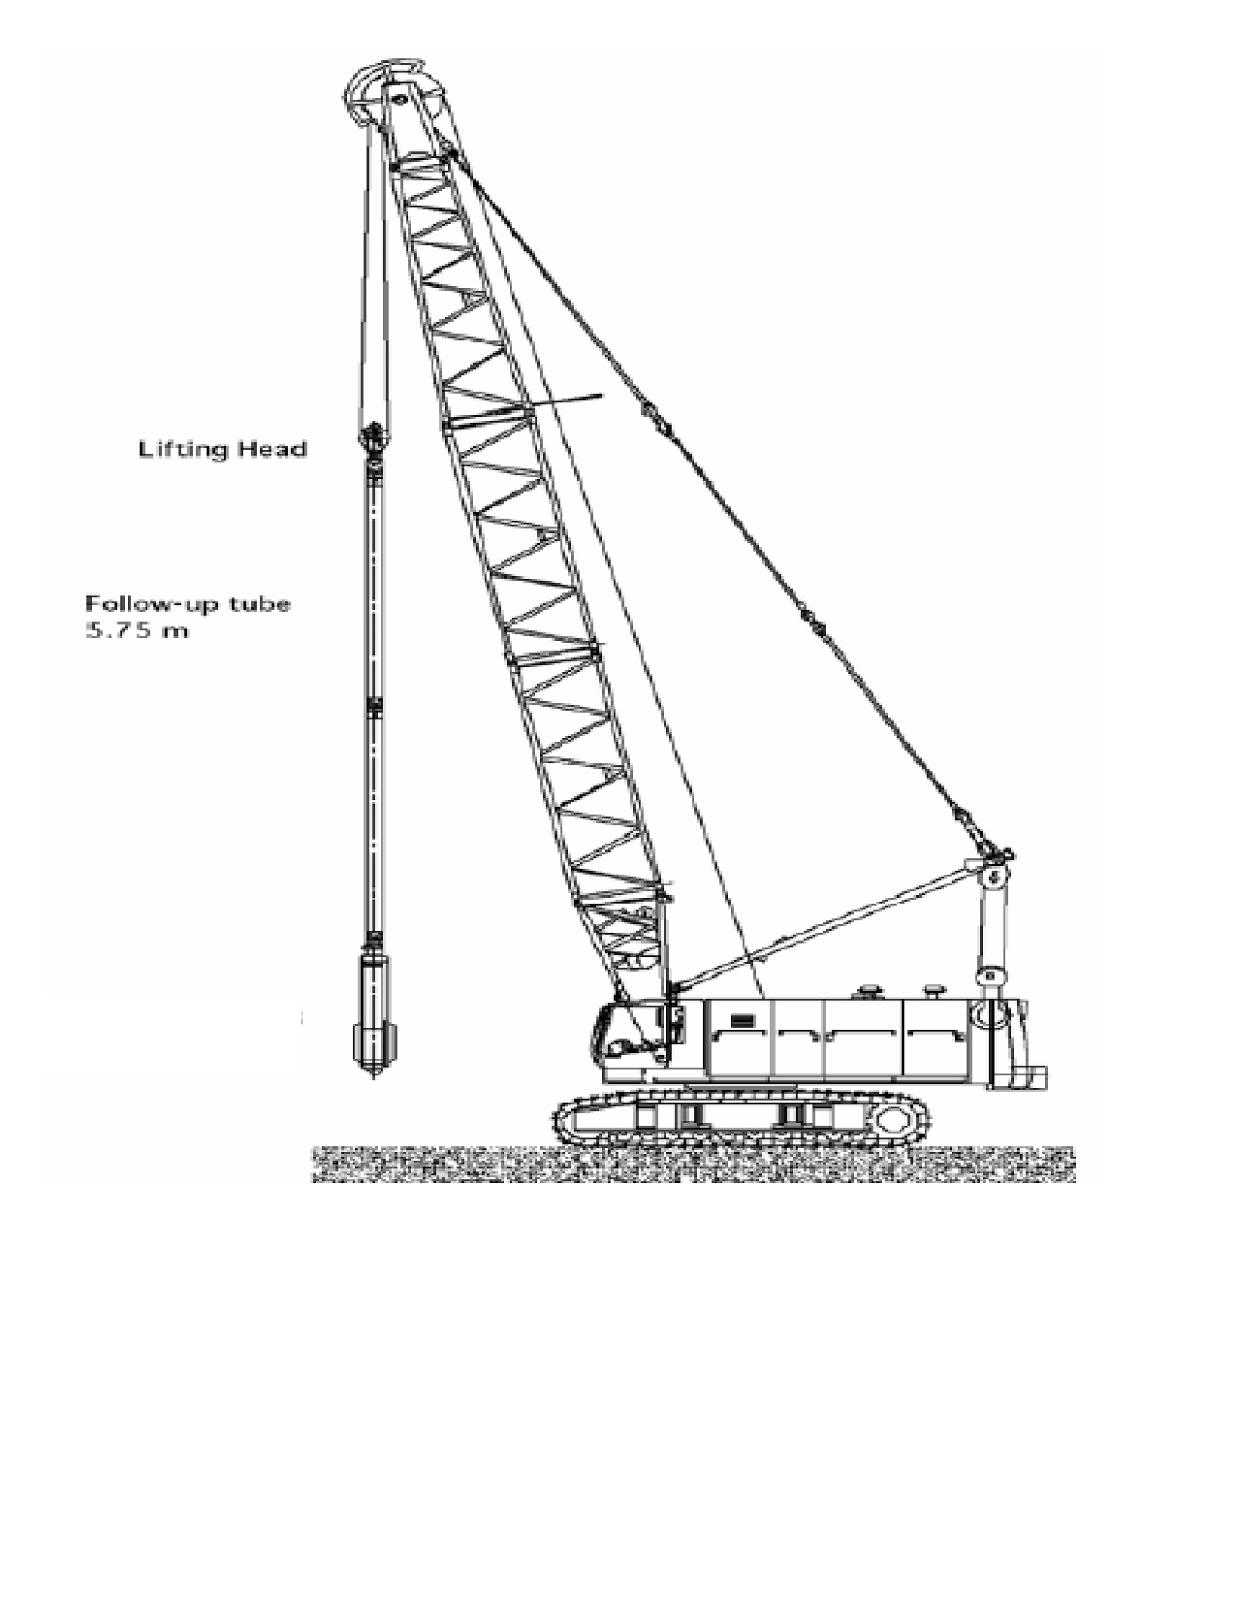 Piling Amp Shoring General Method Statement Amp Design Of A